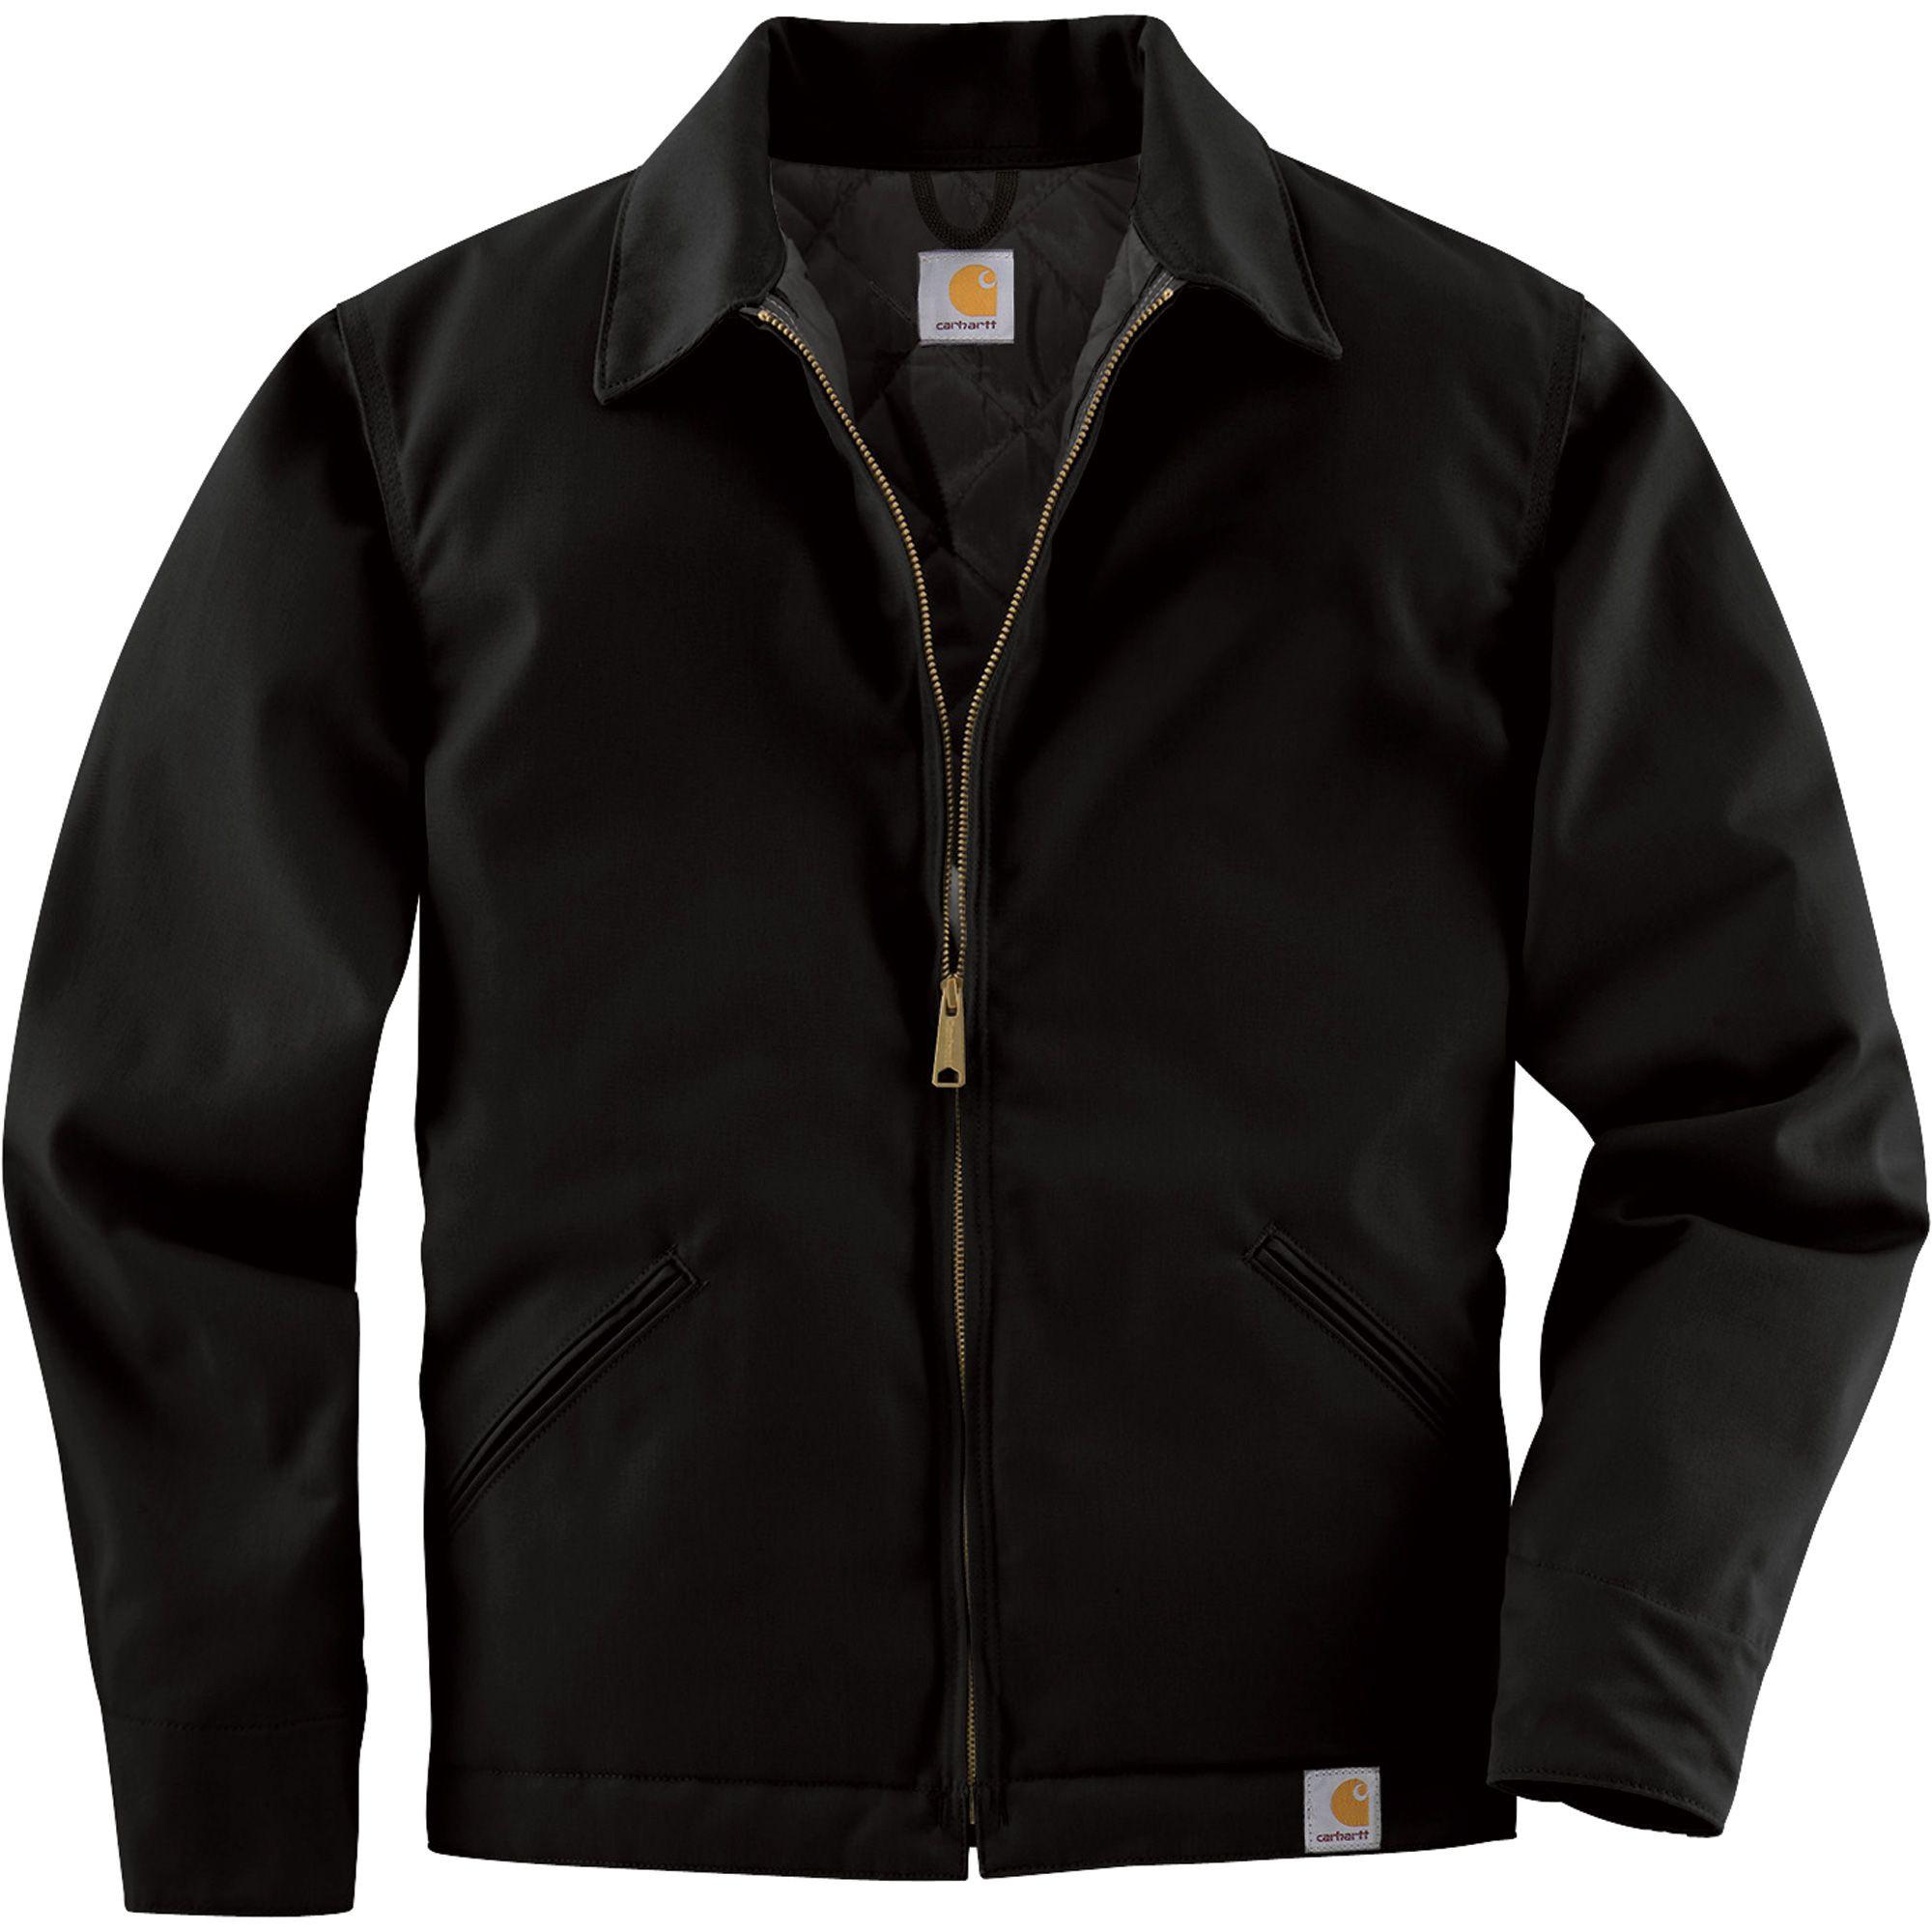 Куртка Carhartt Twill Work Jacket - J293 (Black, XL)